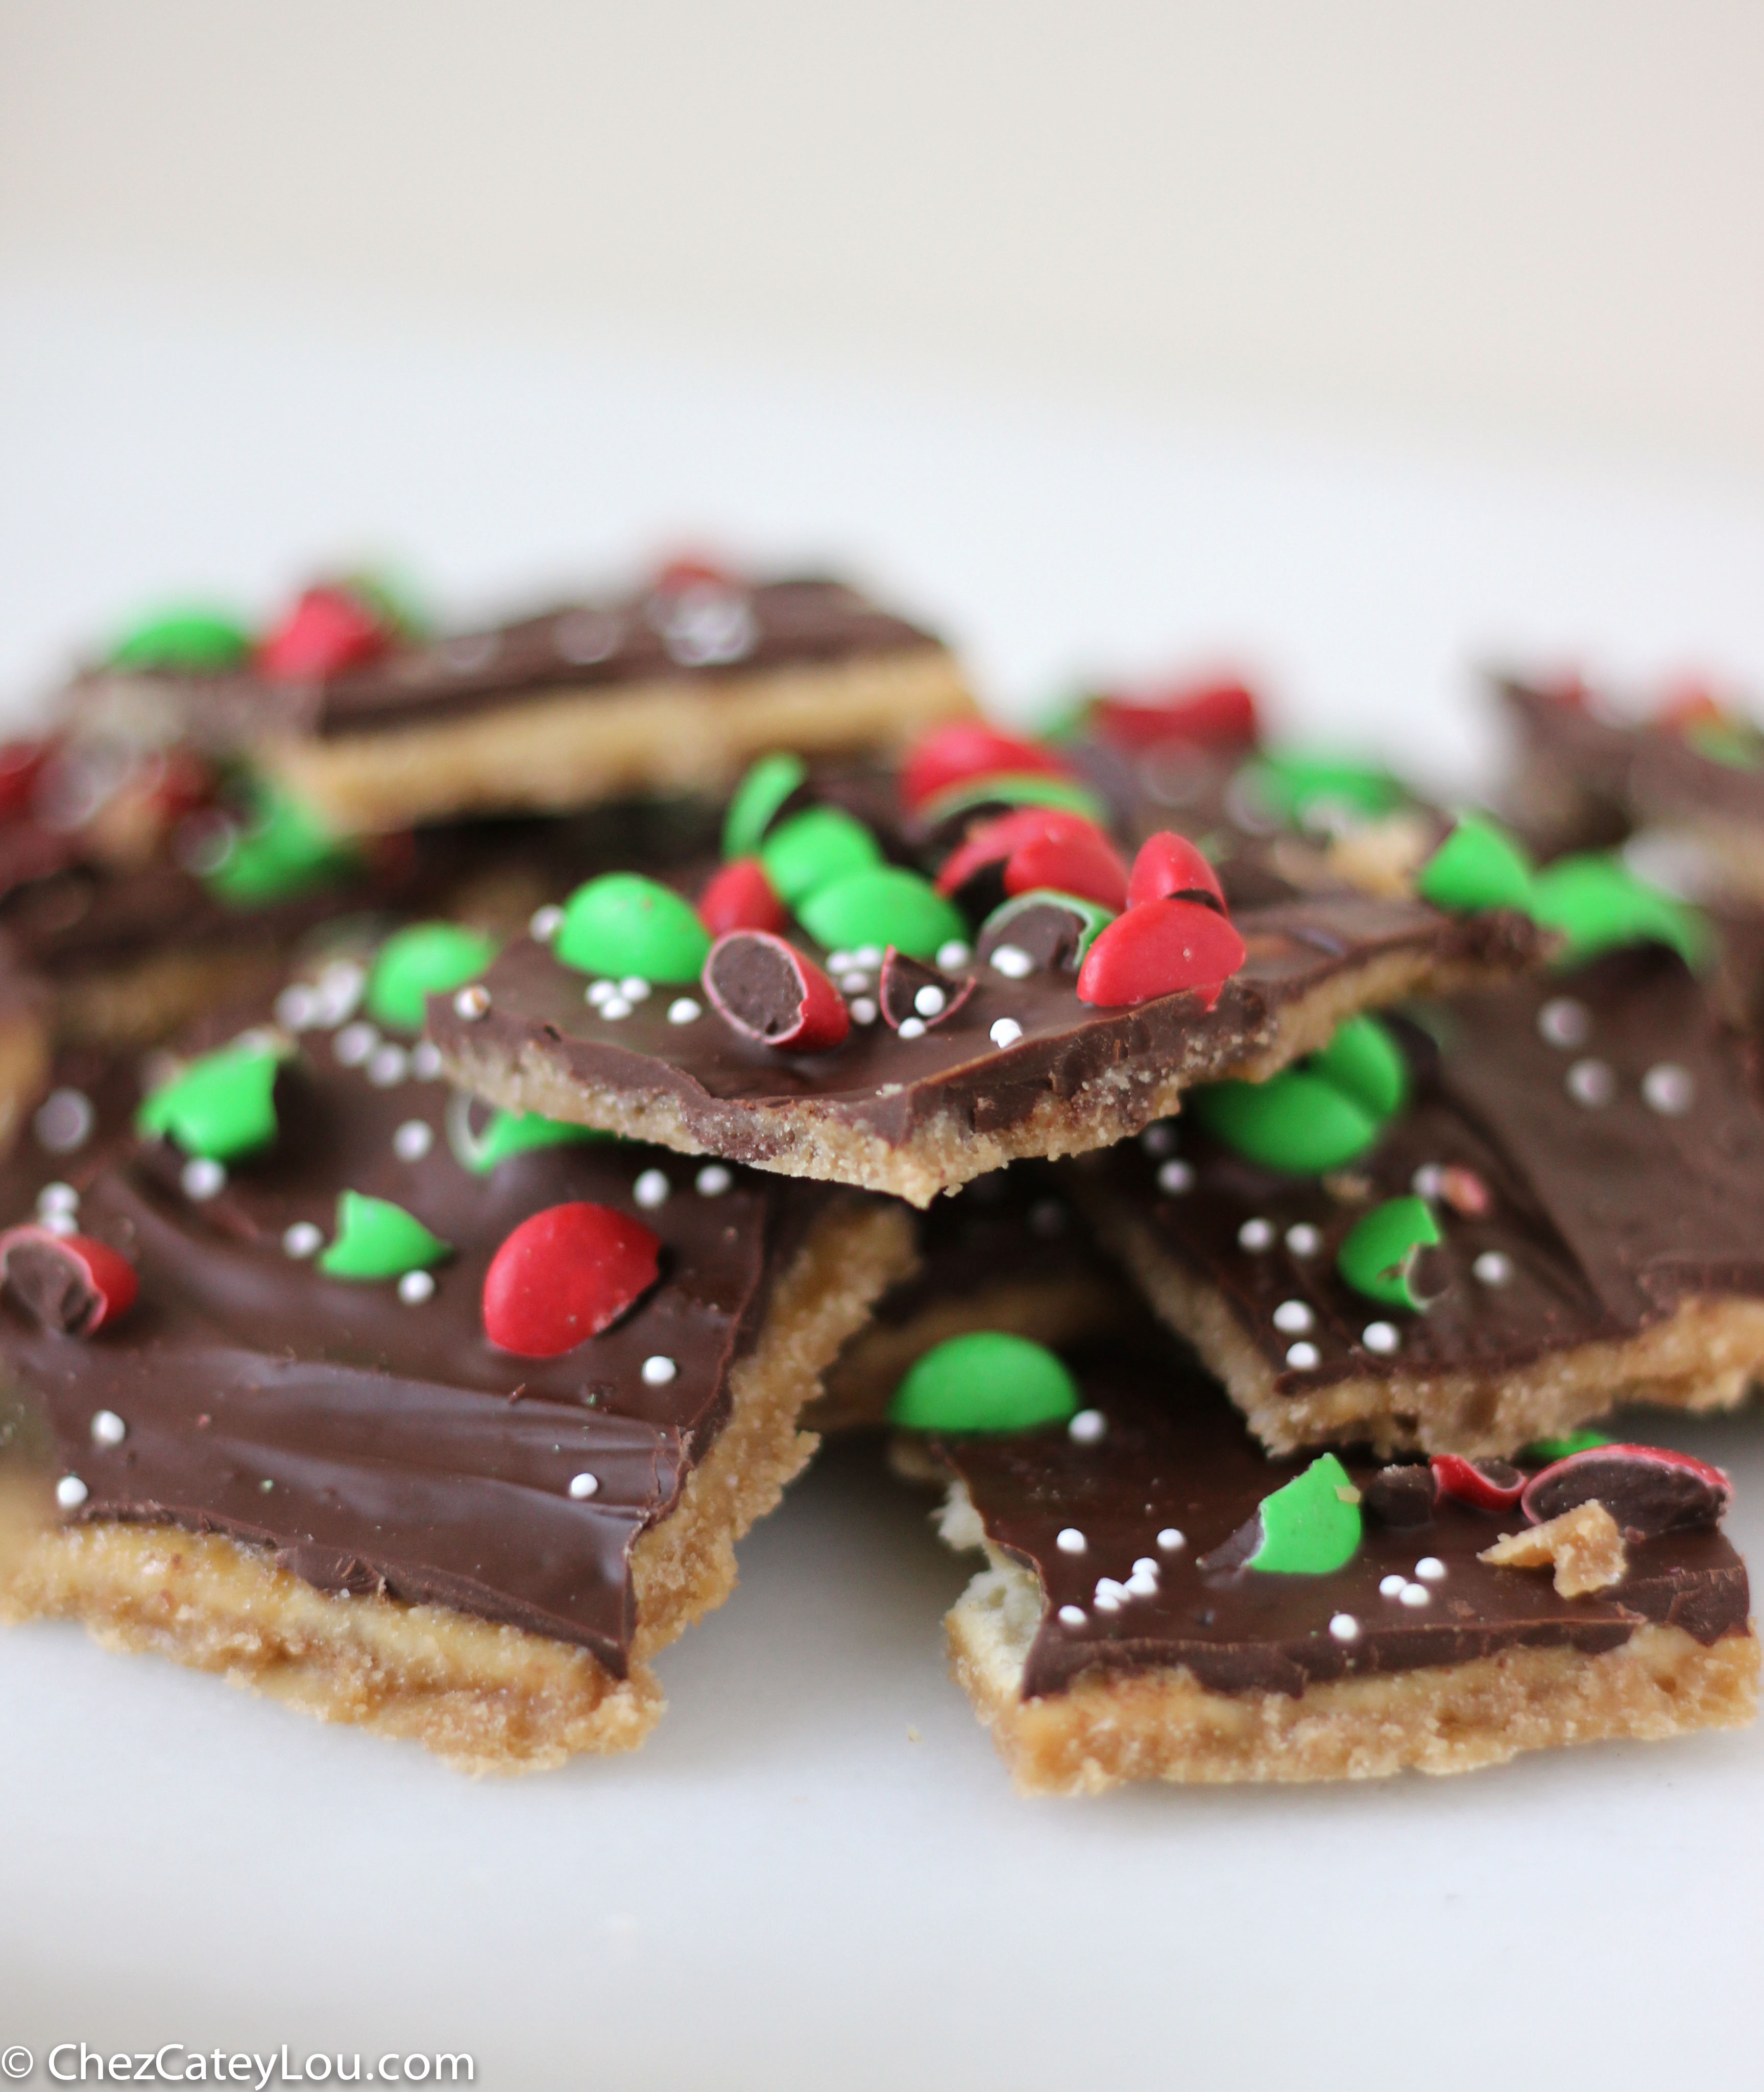 Chocolate Saltine Toffee aka Christmas Crack